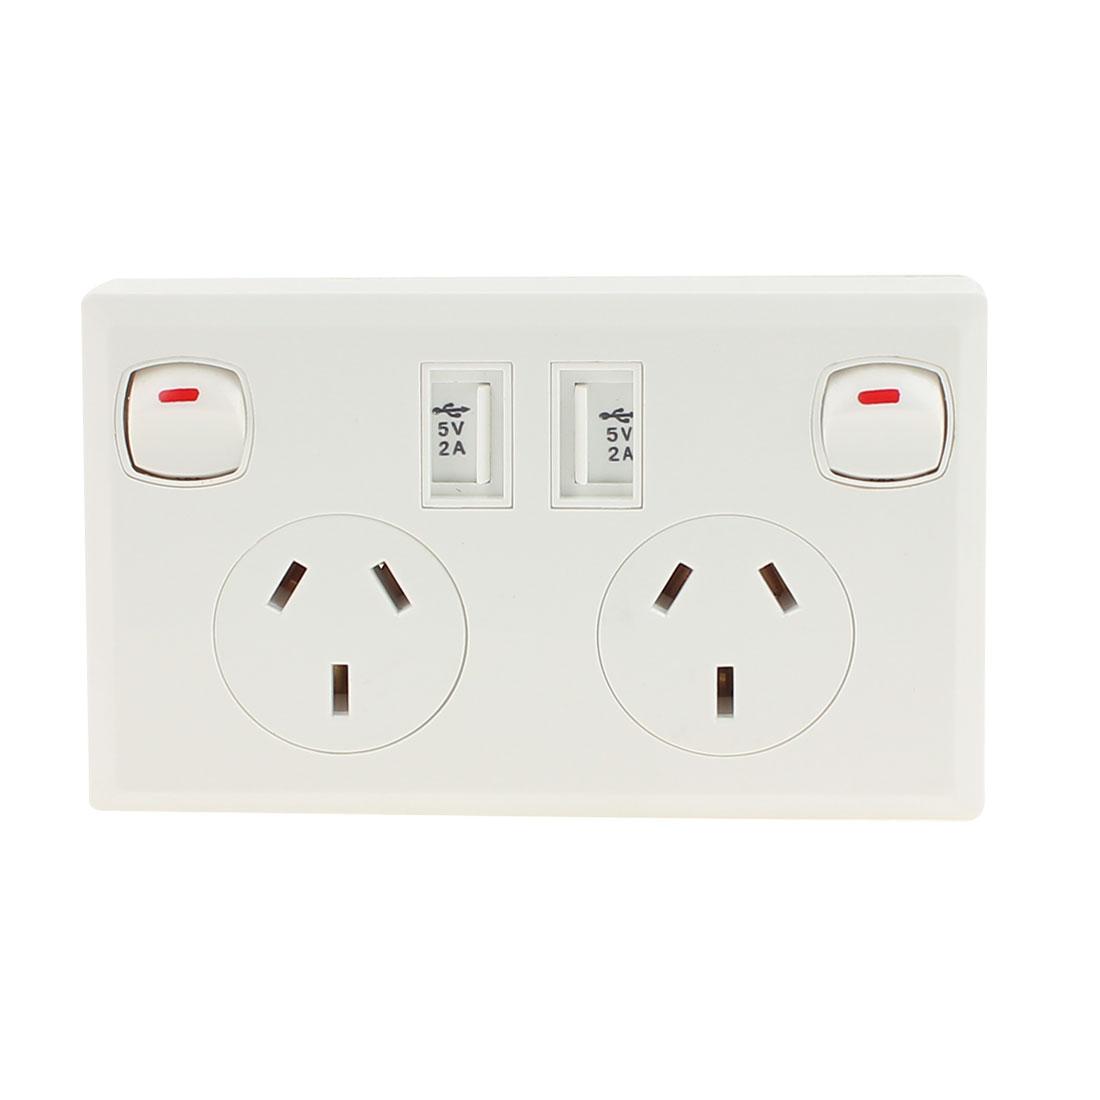 AC 90V-250V AU Socket 2 USB Port 5VDC 2000mA Charger Power Switch Wall Outlet